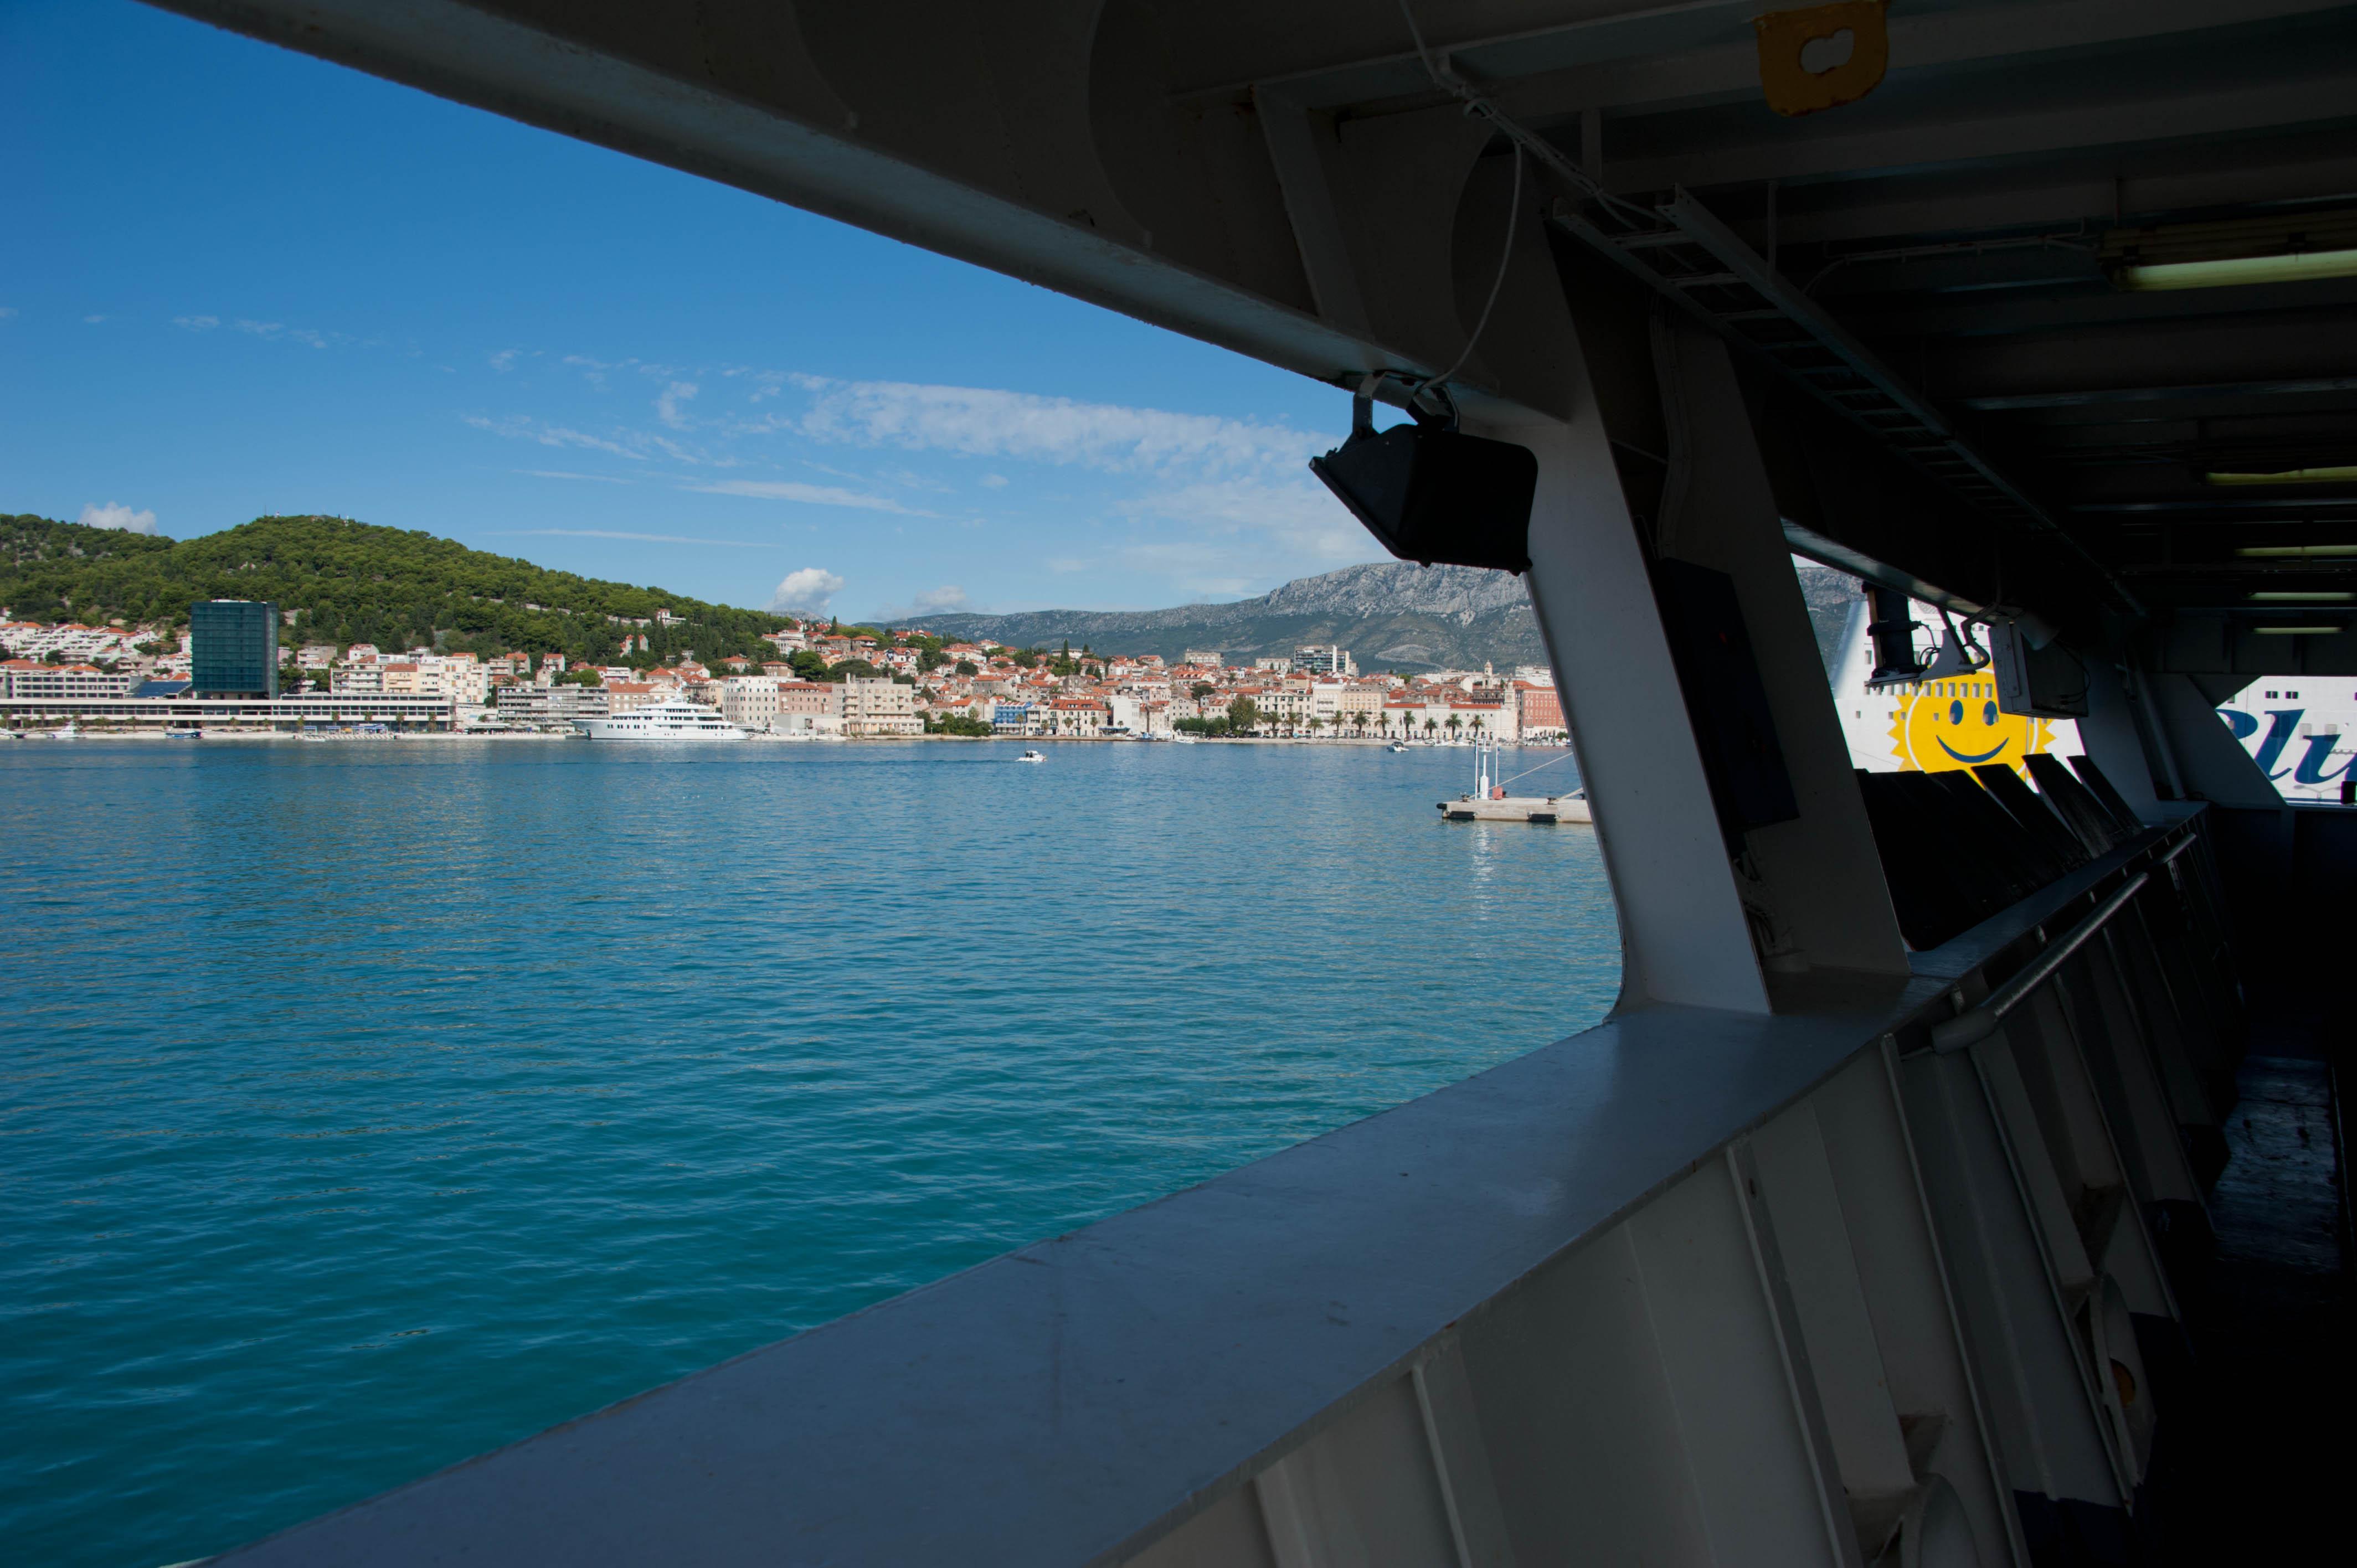 9815-Split (Dalmatie centrale)